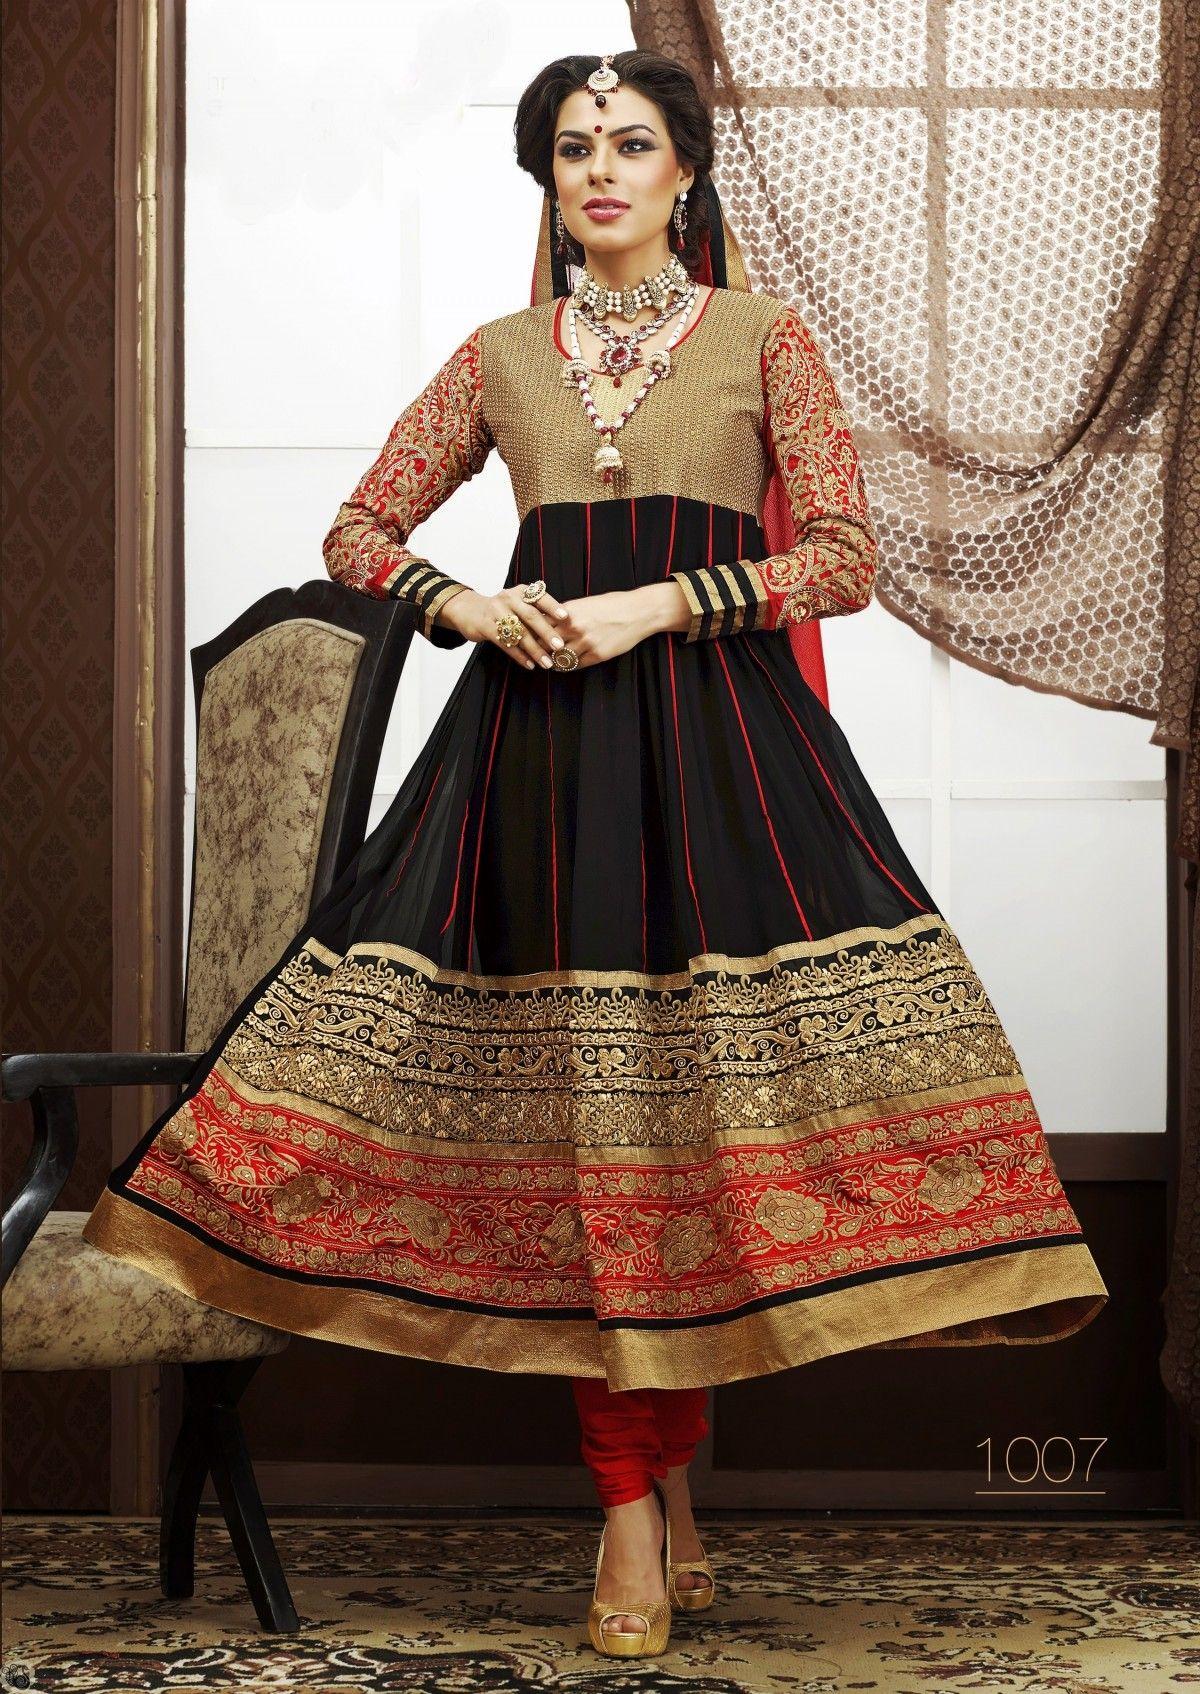 Online shop for ladies garments, including sarees